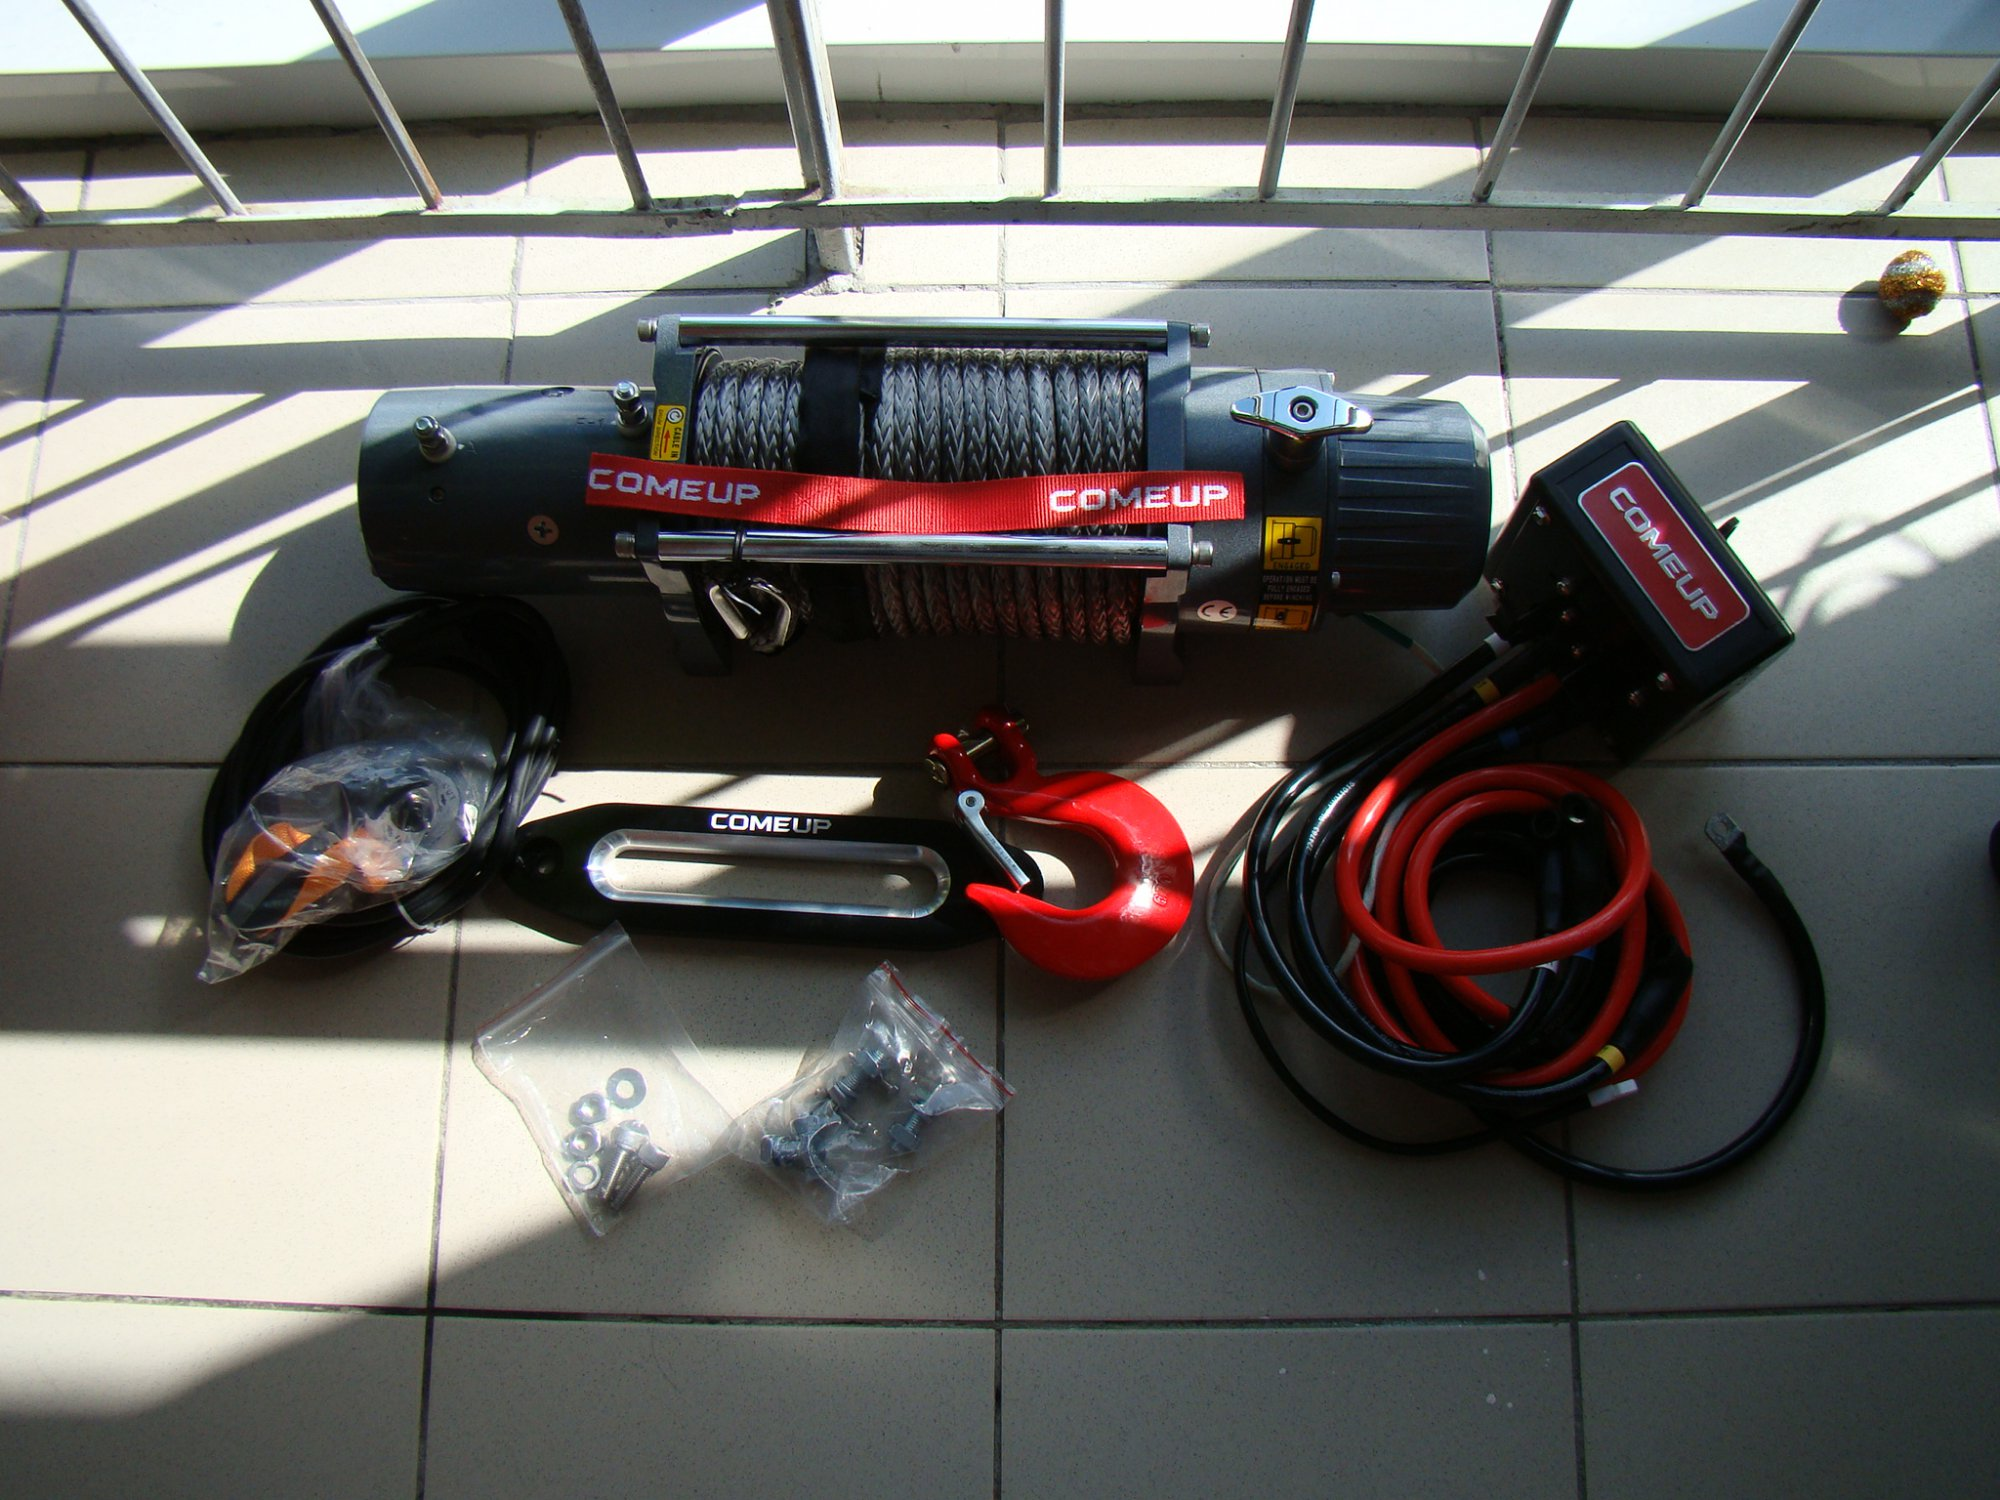 DSC02308.JPG